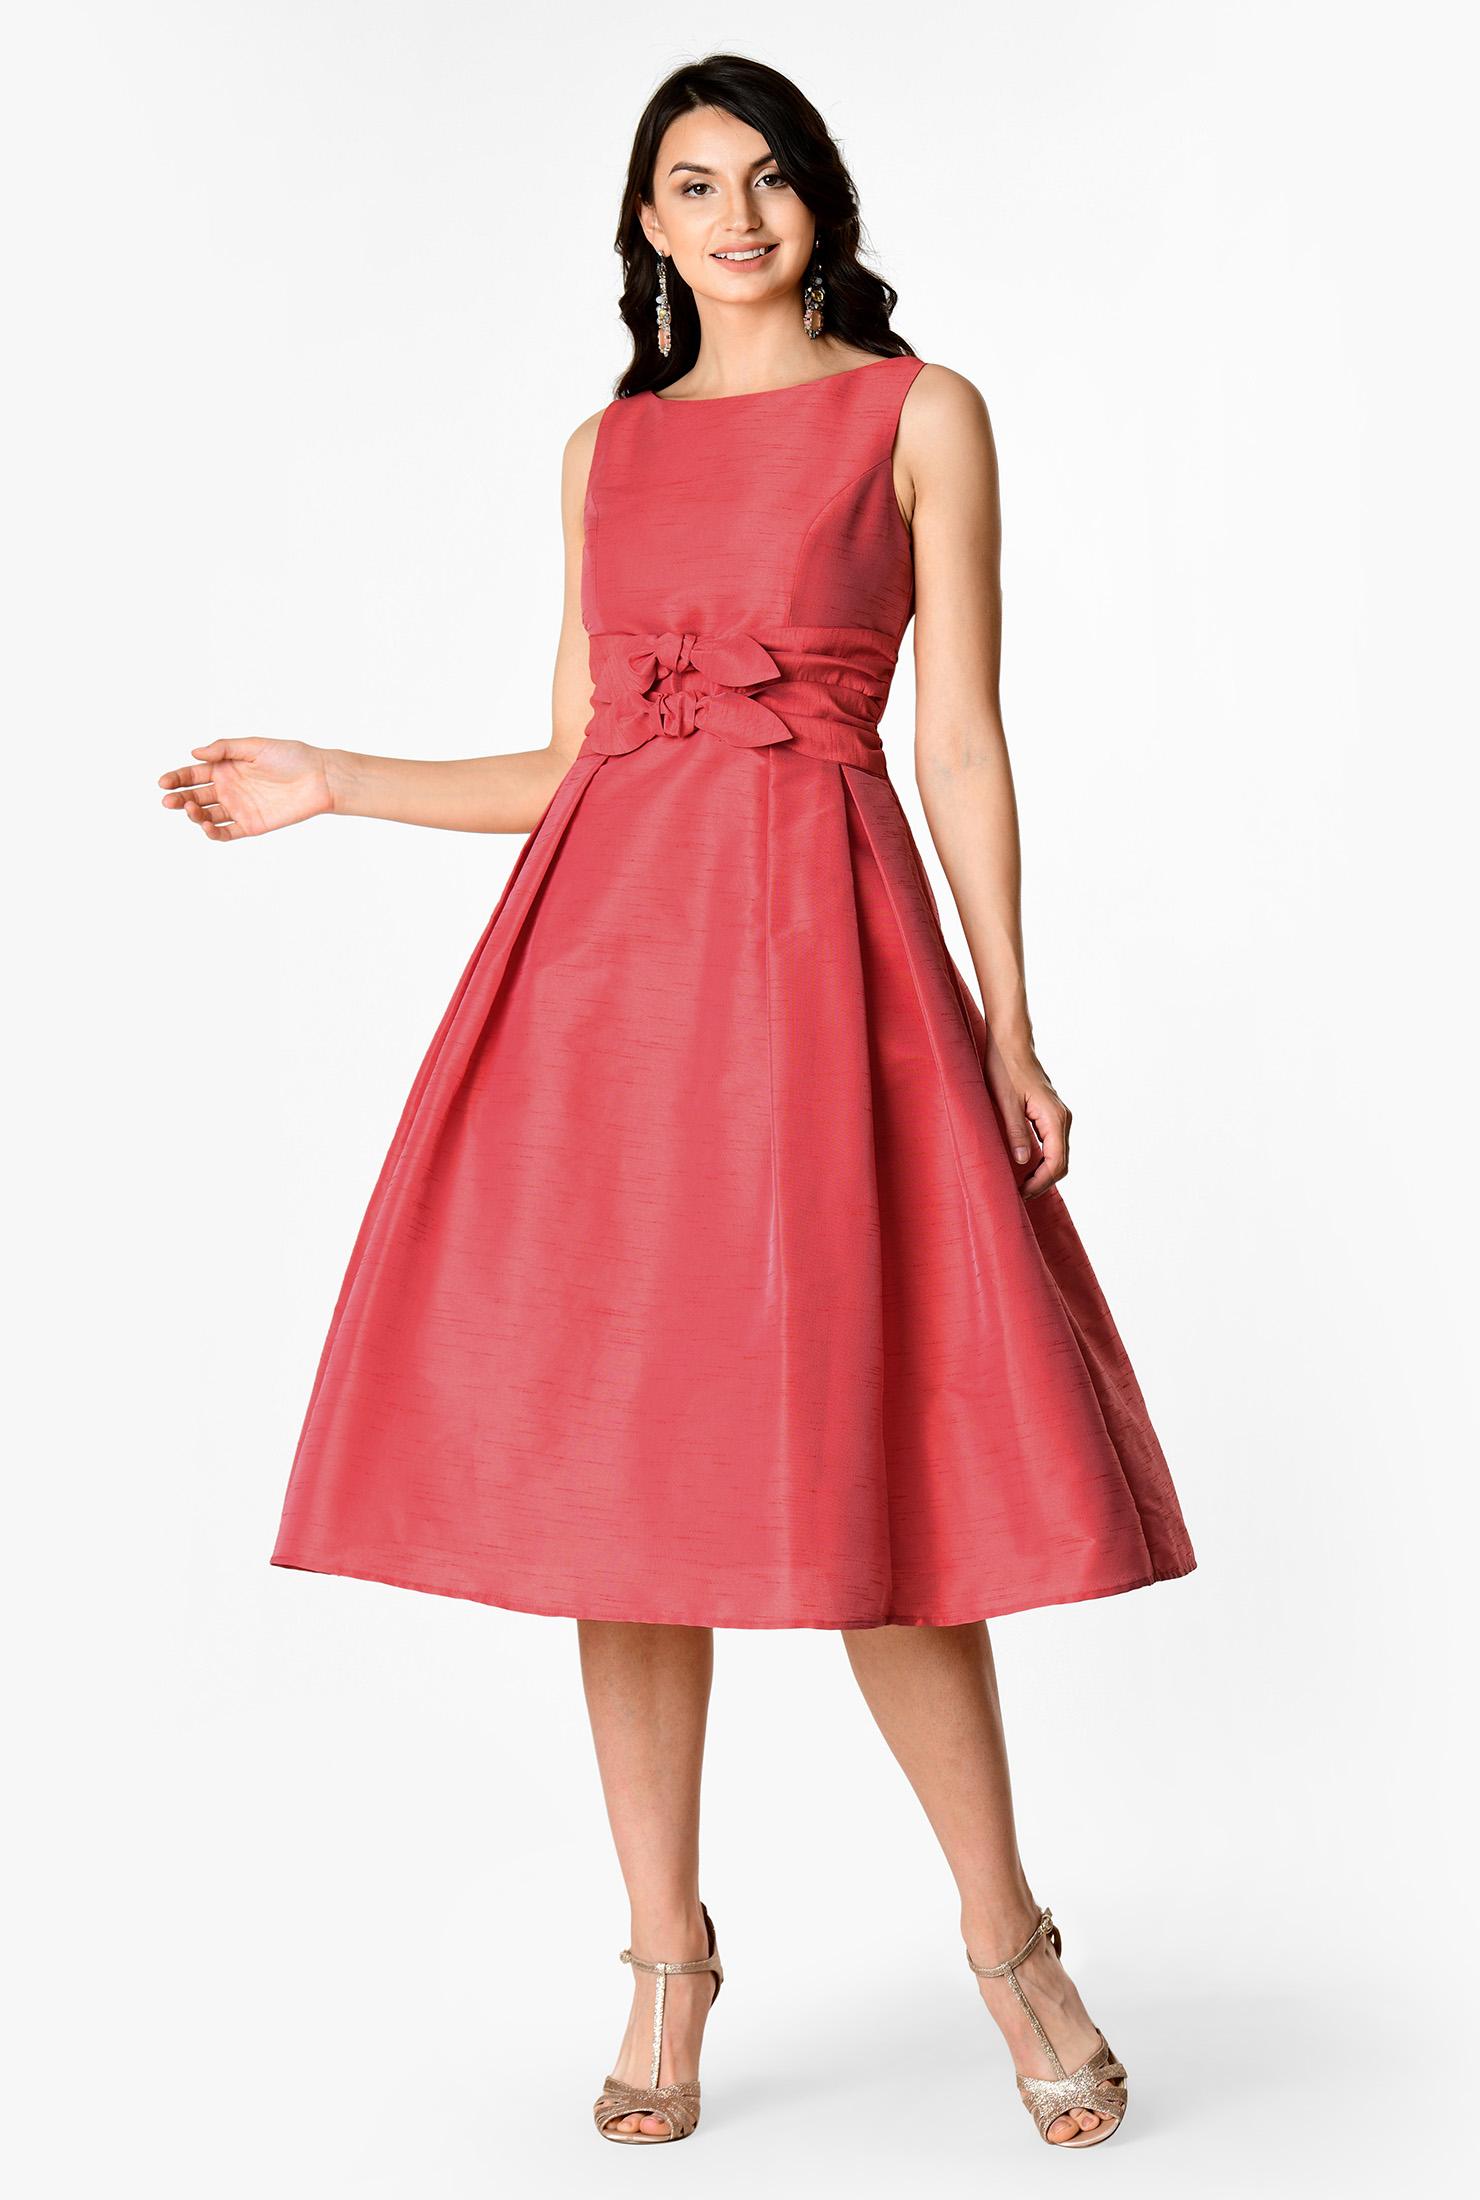 51706241a0 Black Tie Affair Dresses Plus Size - Gomes Weine AG